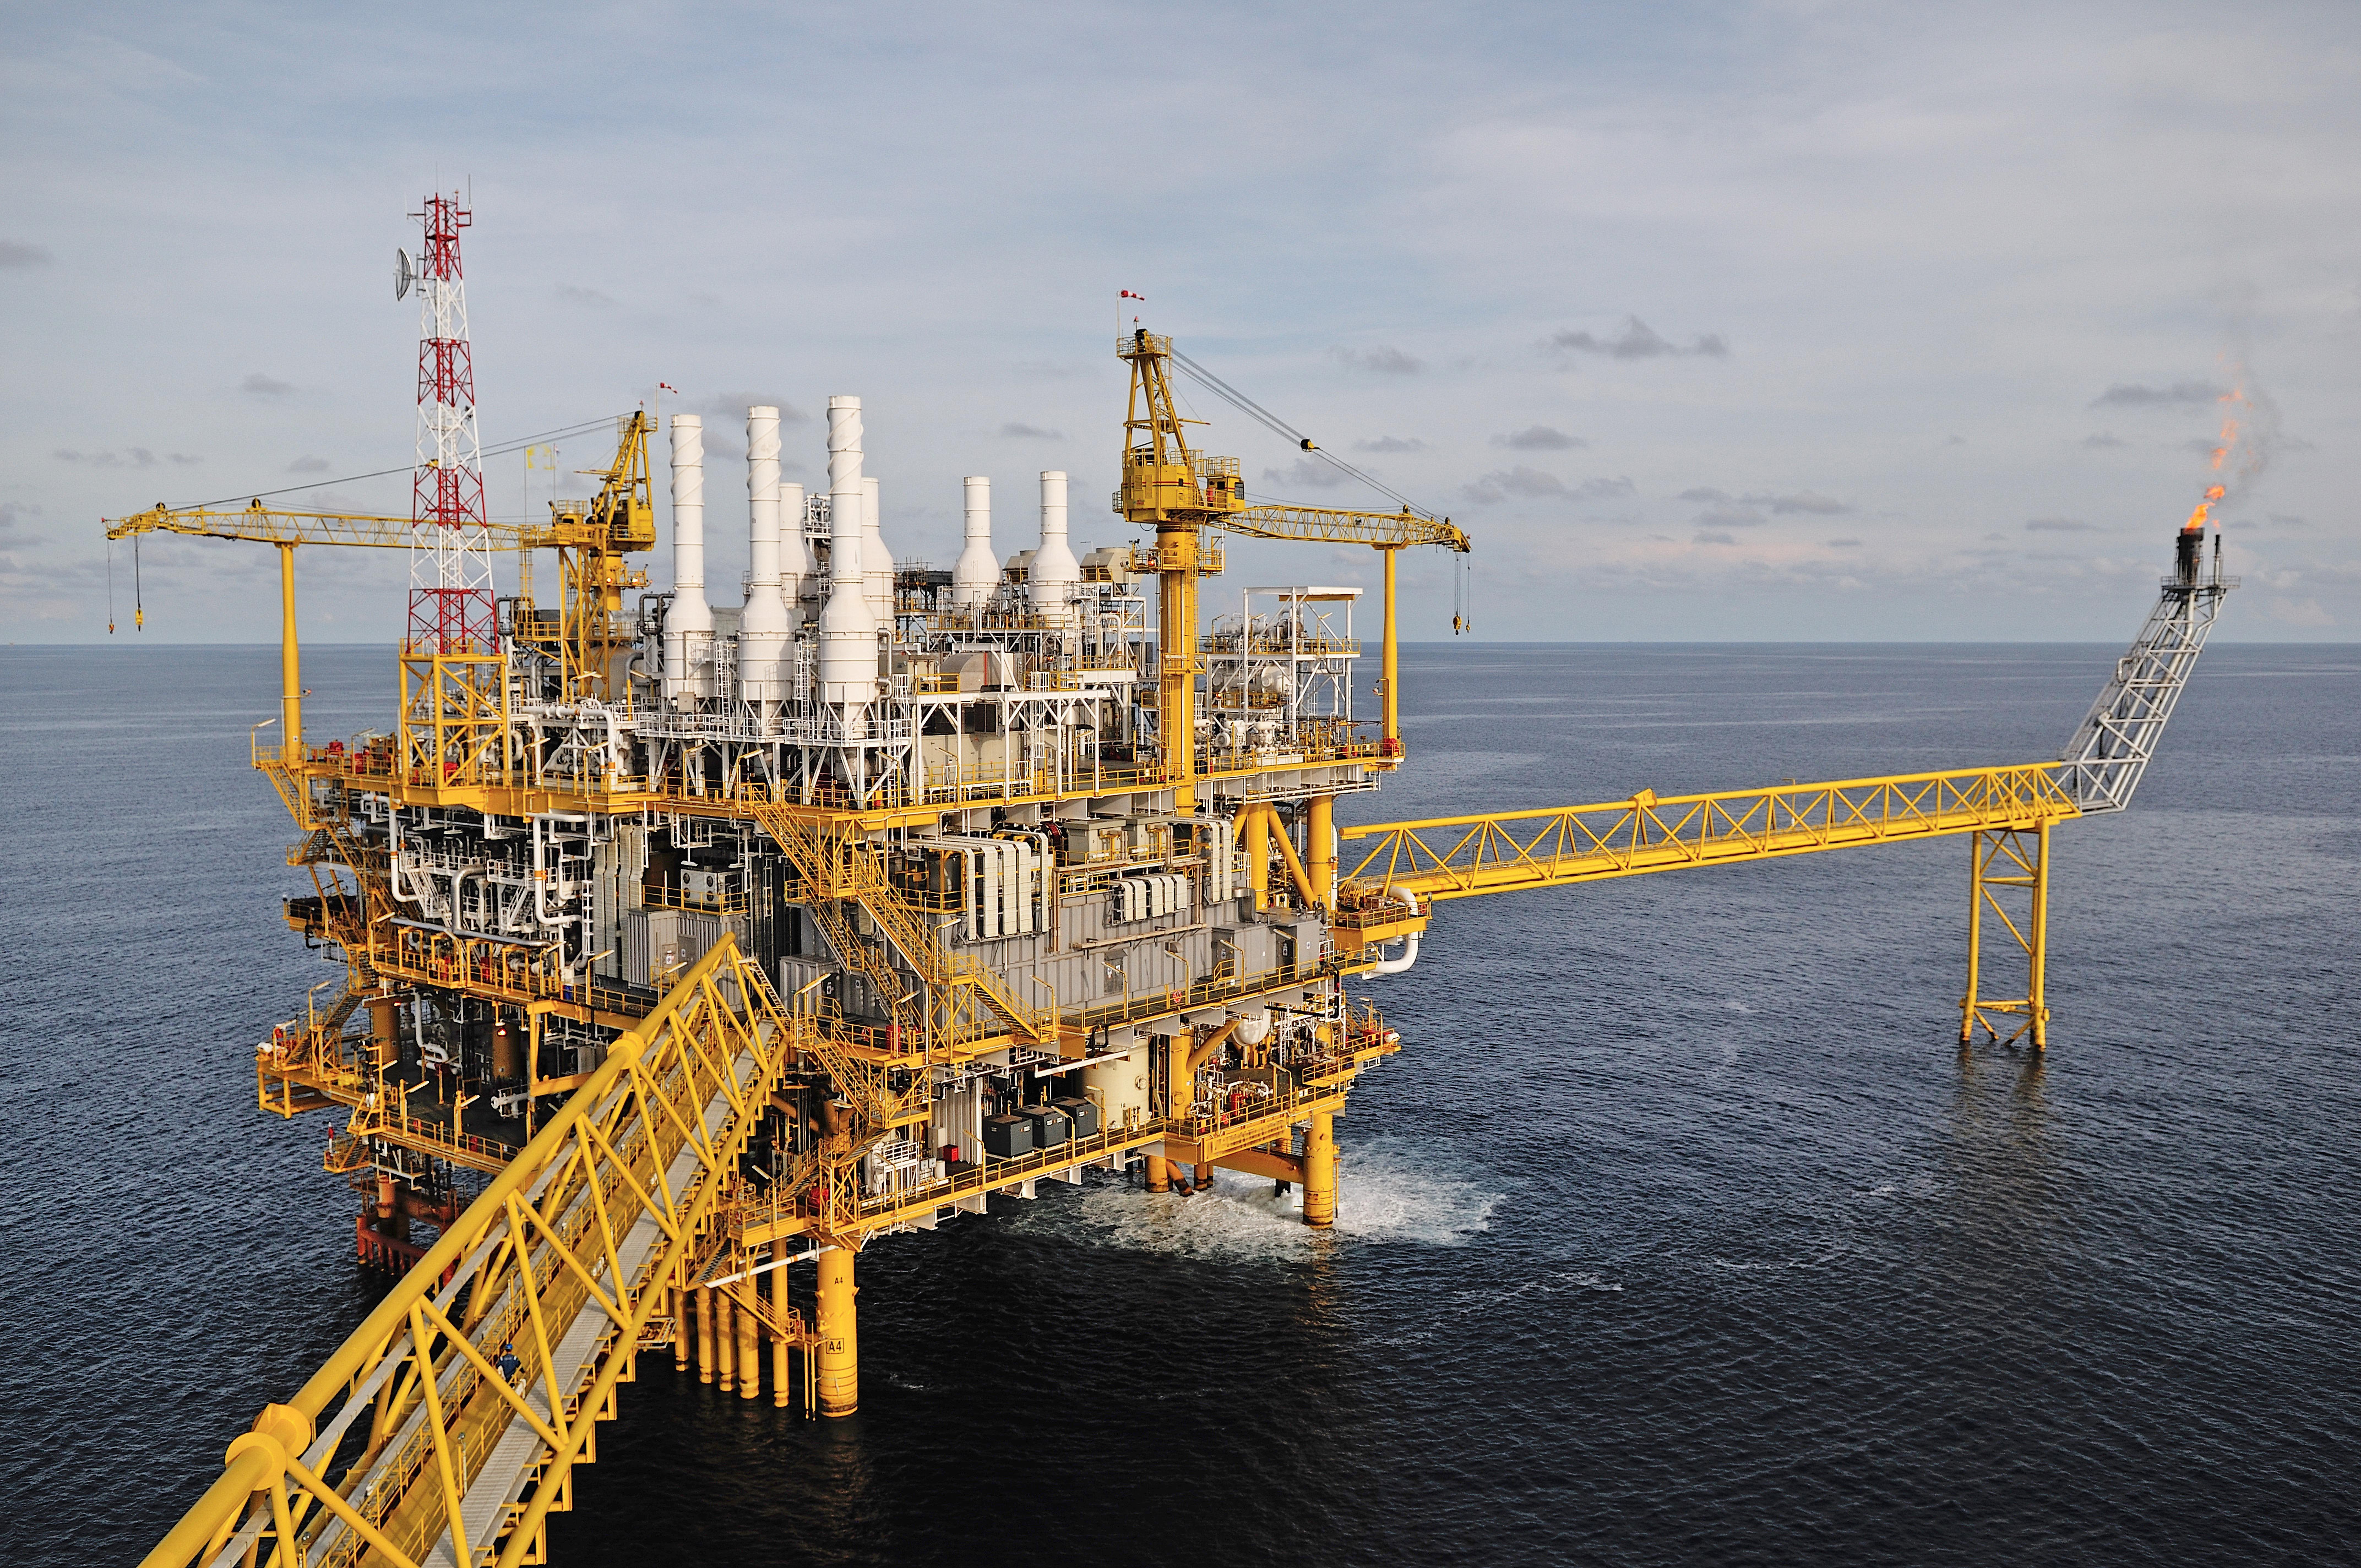 Oil and Gas Platform Image